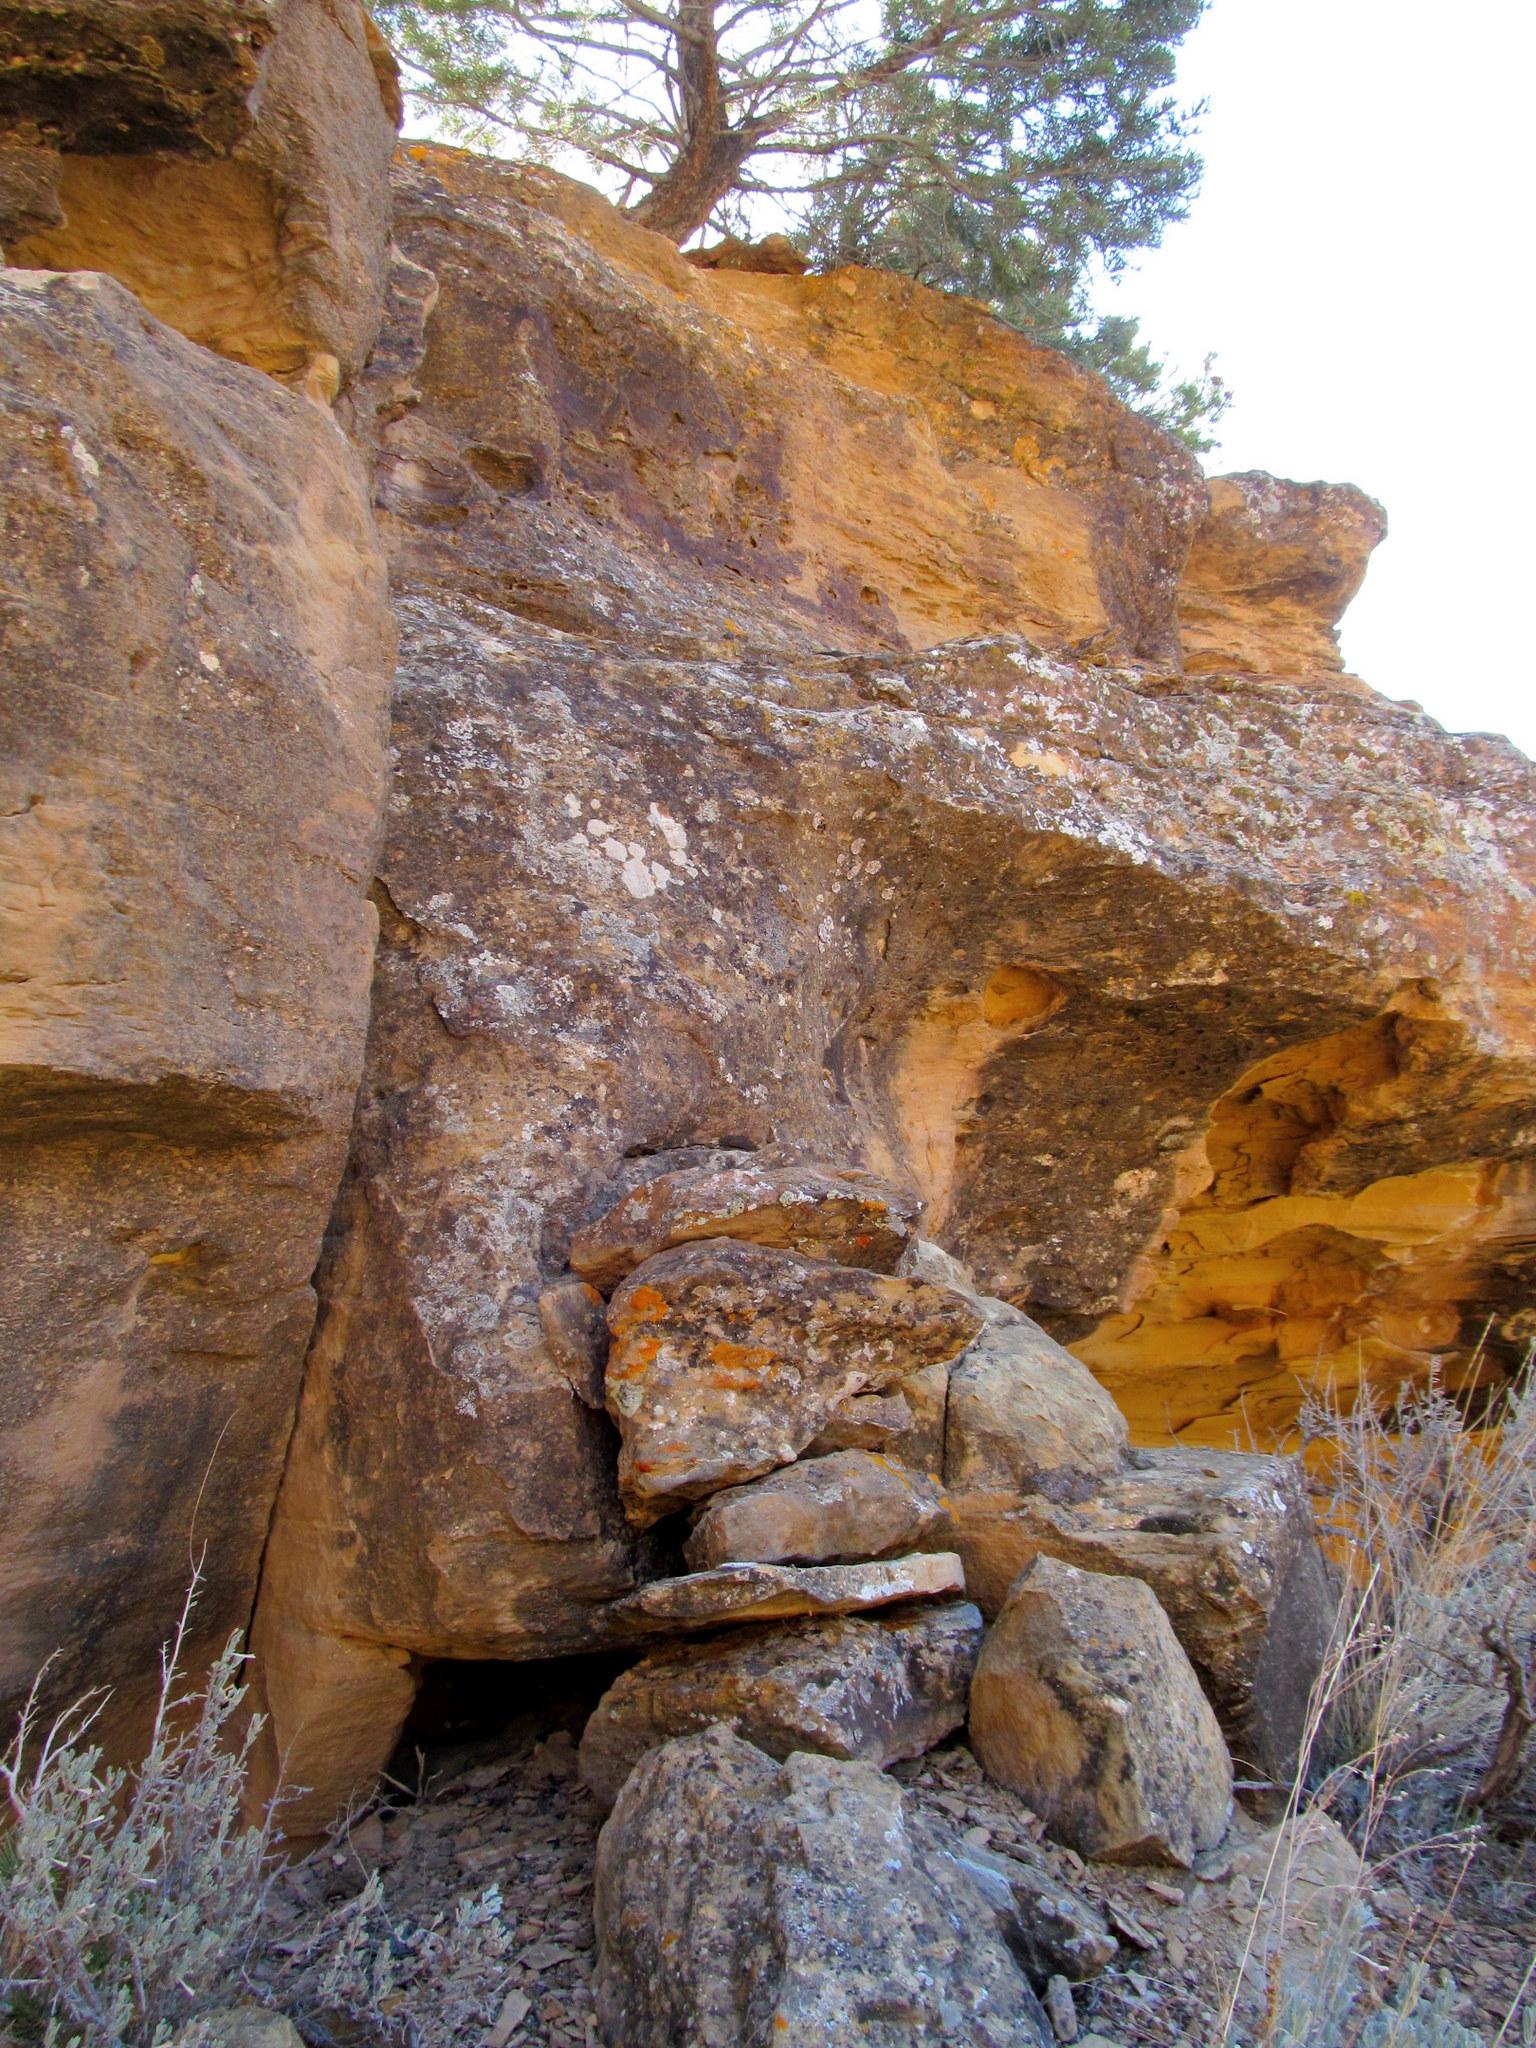 Photo: Rocks stacked to aid the climb